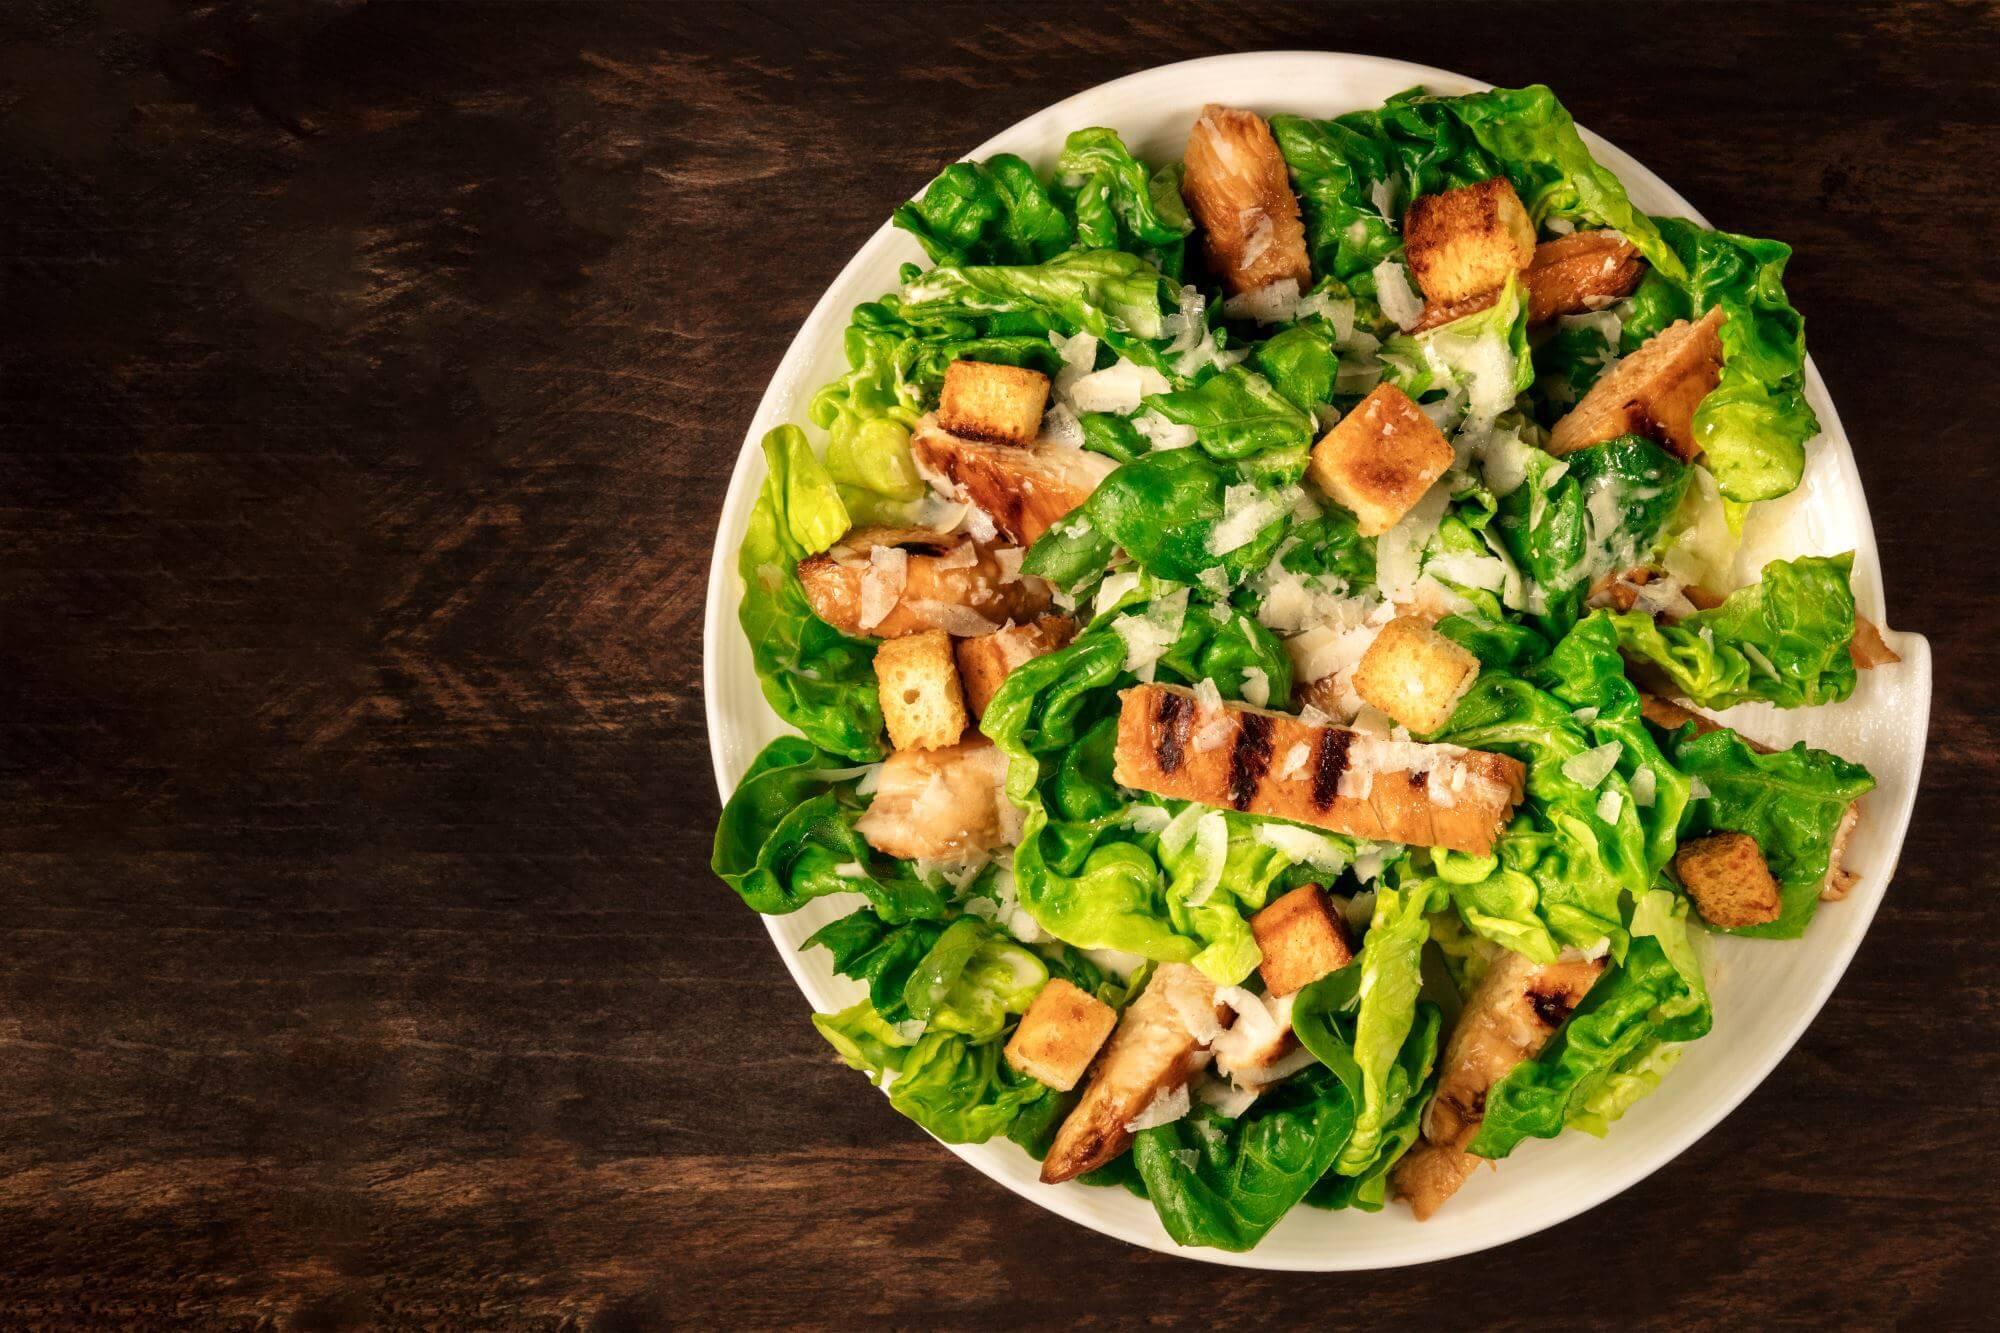 Cæsarsalat med grillet kylling